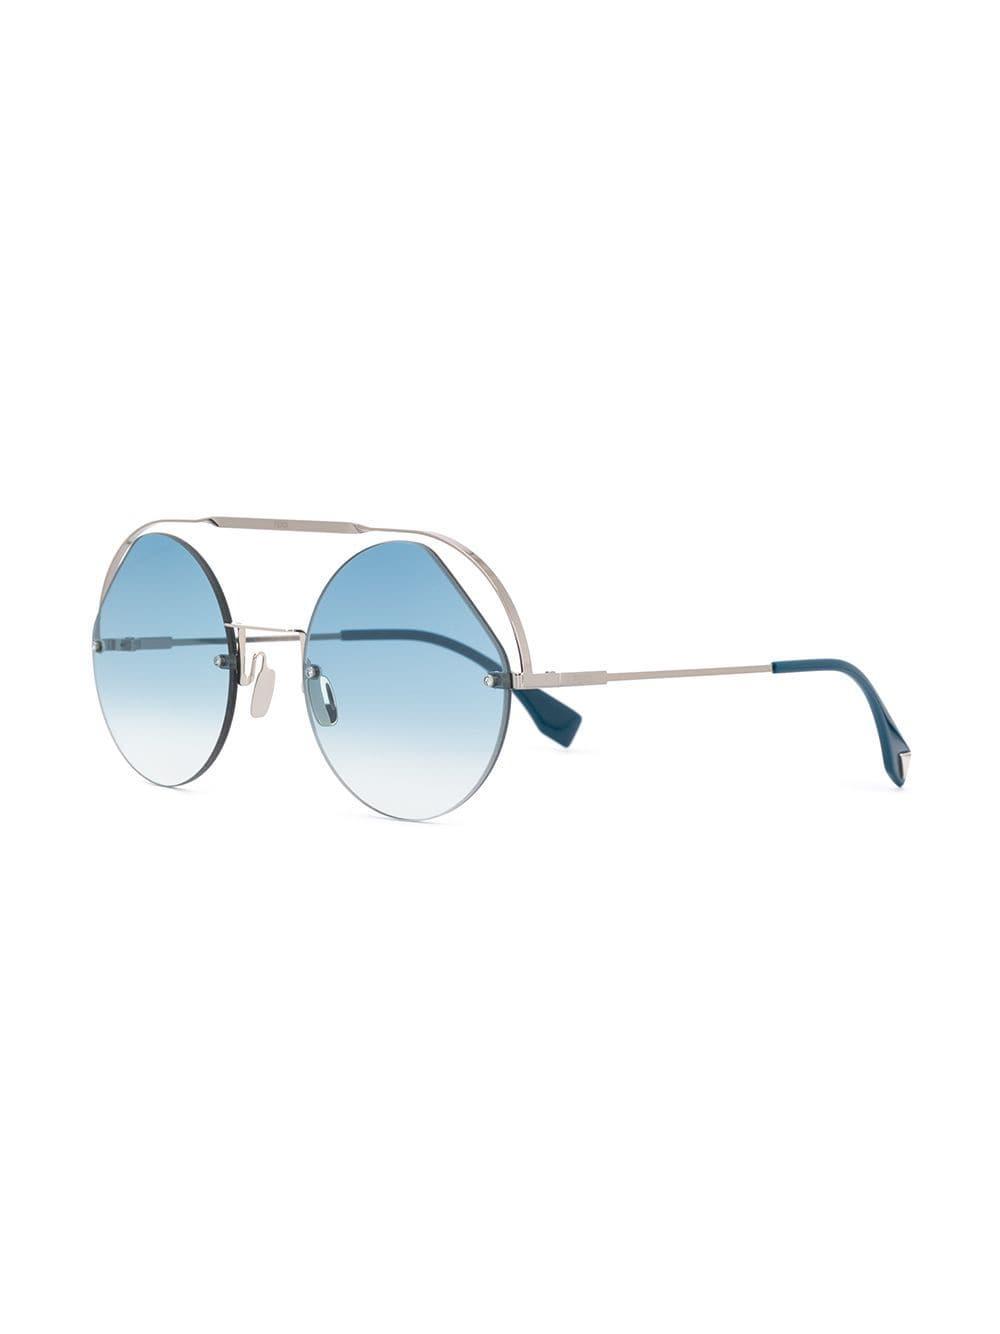 6e287dec20 Eyewear gafas de sol ribbons & crystals - plateado